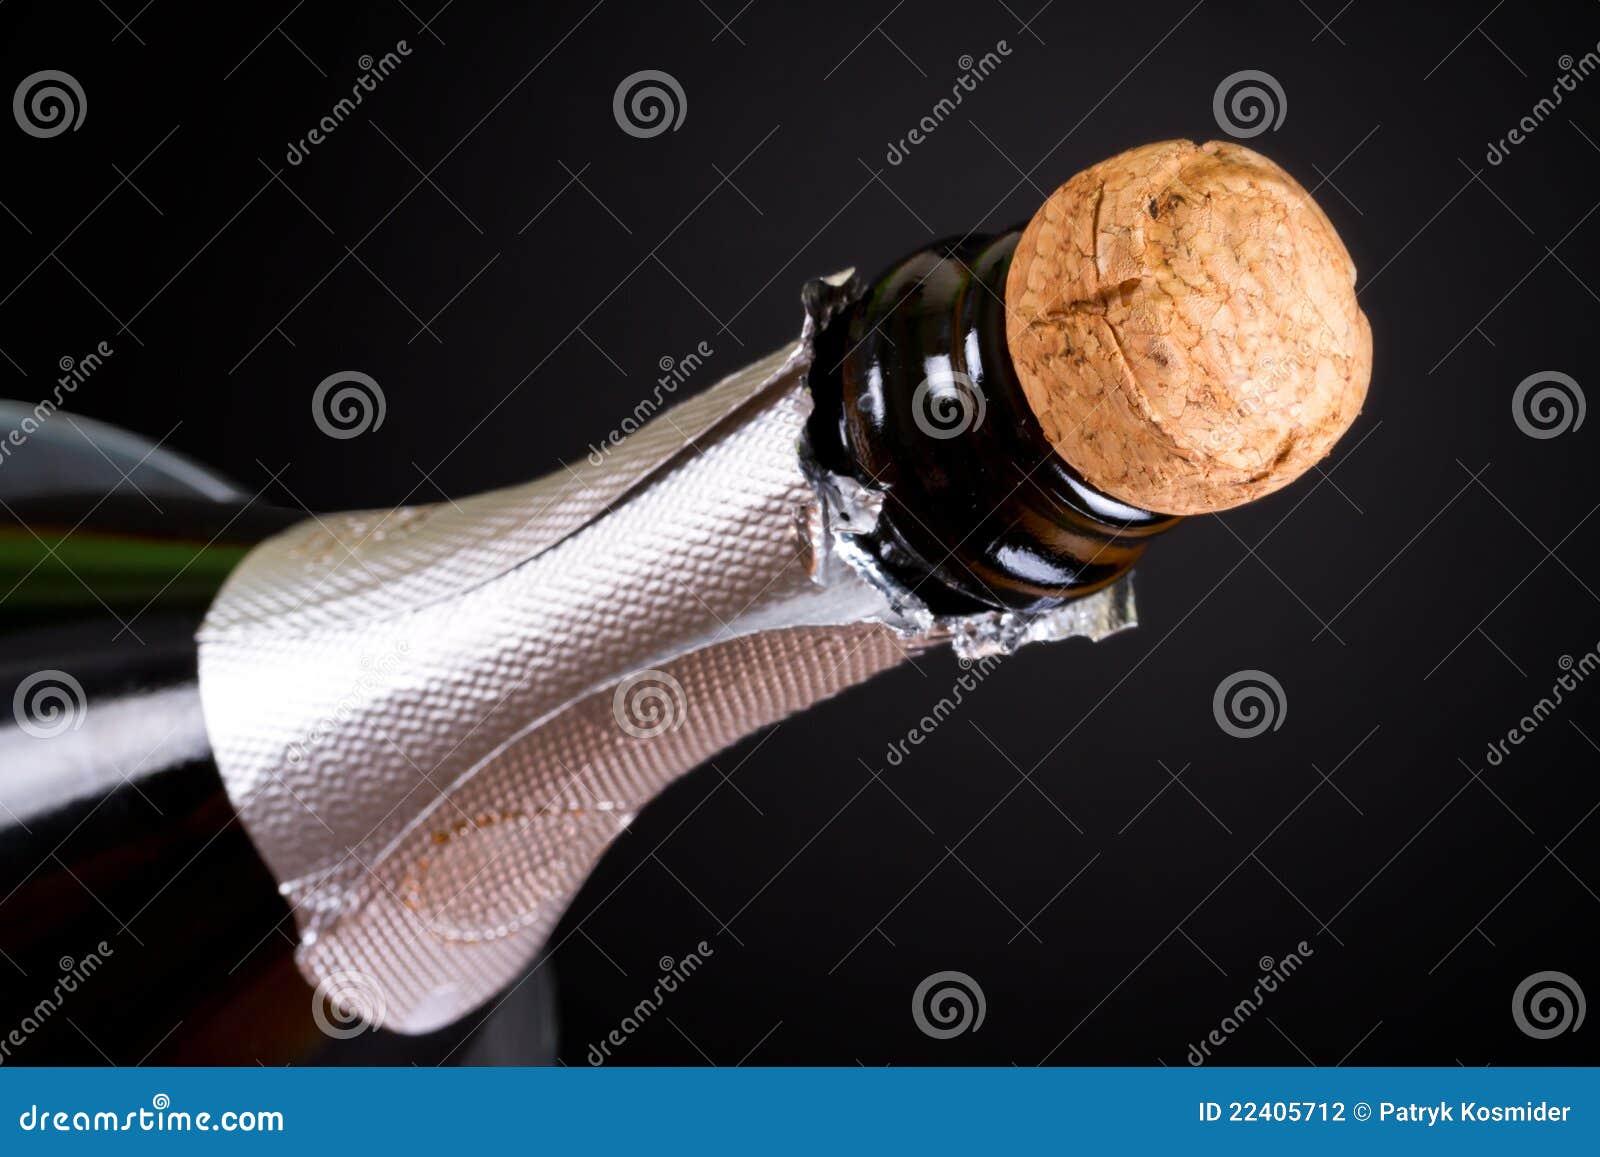 Long neck champagne bottle